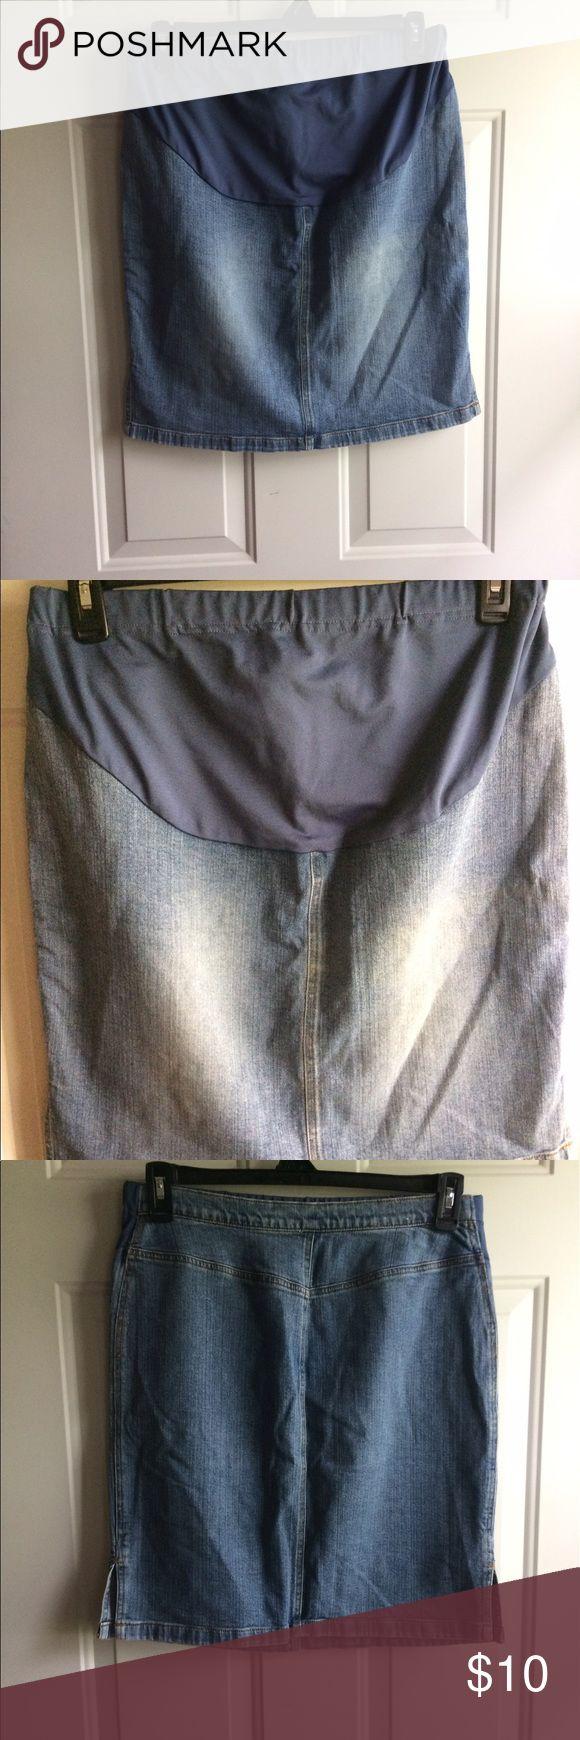 Medium Old Navy Maternity Jean Skirt Medium Old Navy Maternity Jean Skirt. Smoke free home Old Navy Skirts Mini